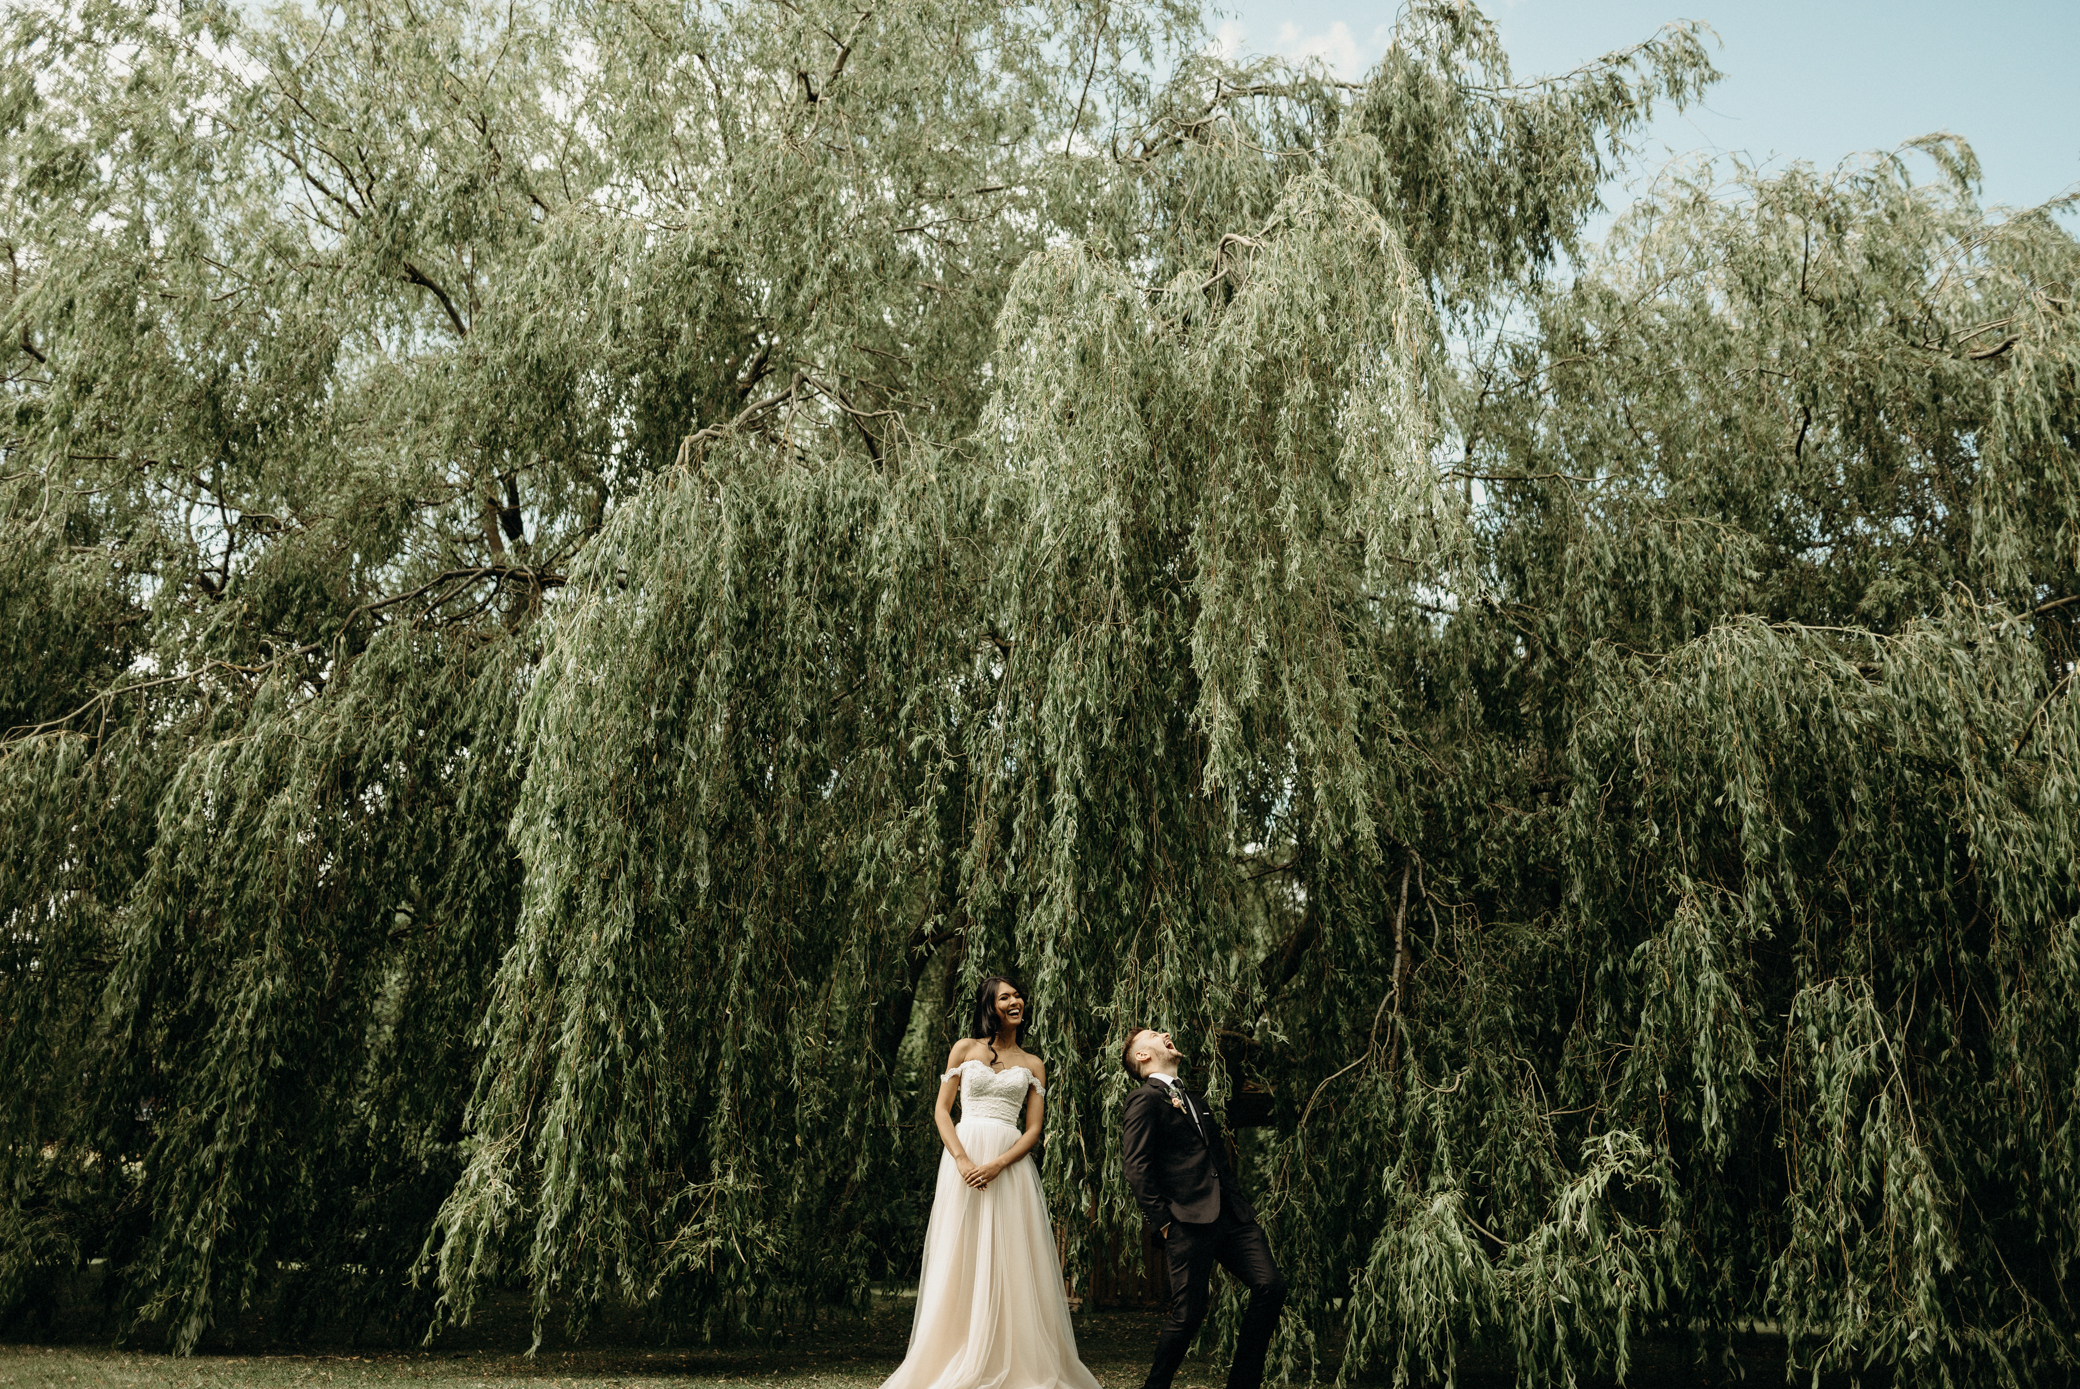 Alan&Naz- Barberstown Castle Wedding - Wedding photographer Ireland-169.jpg